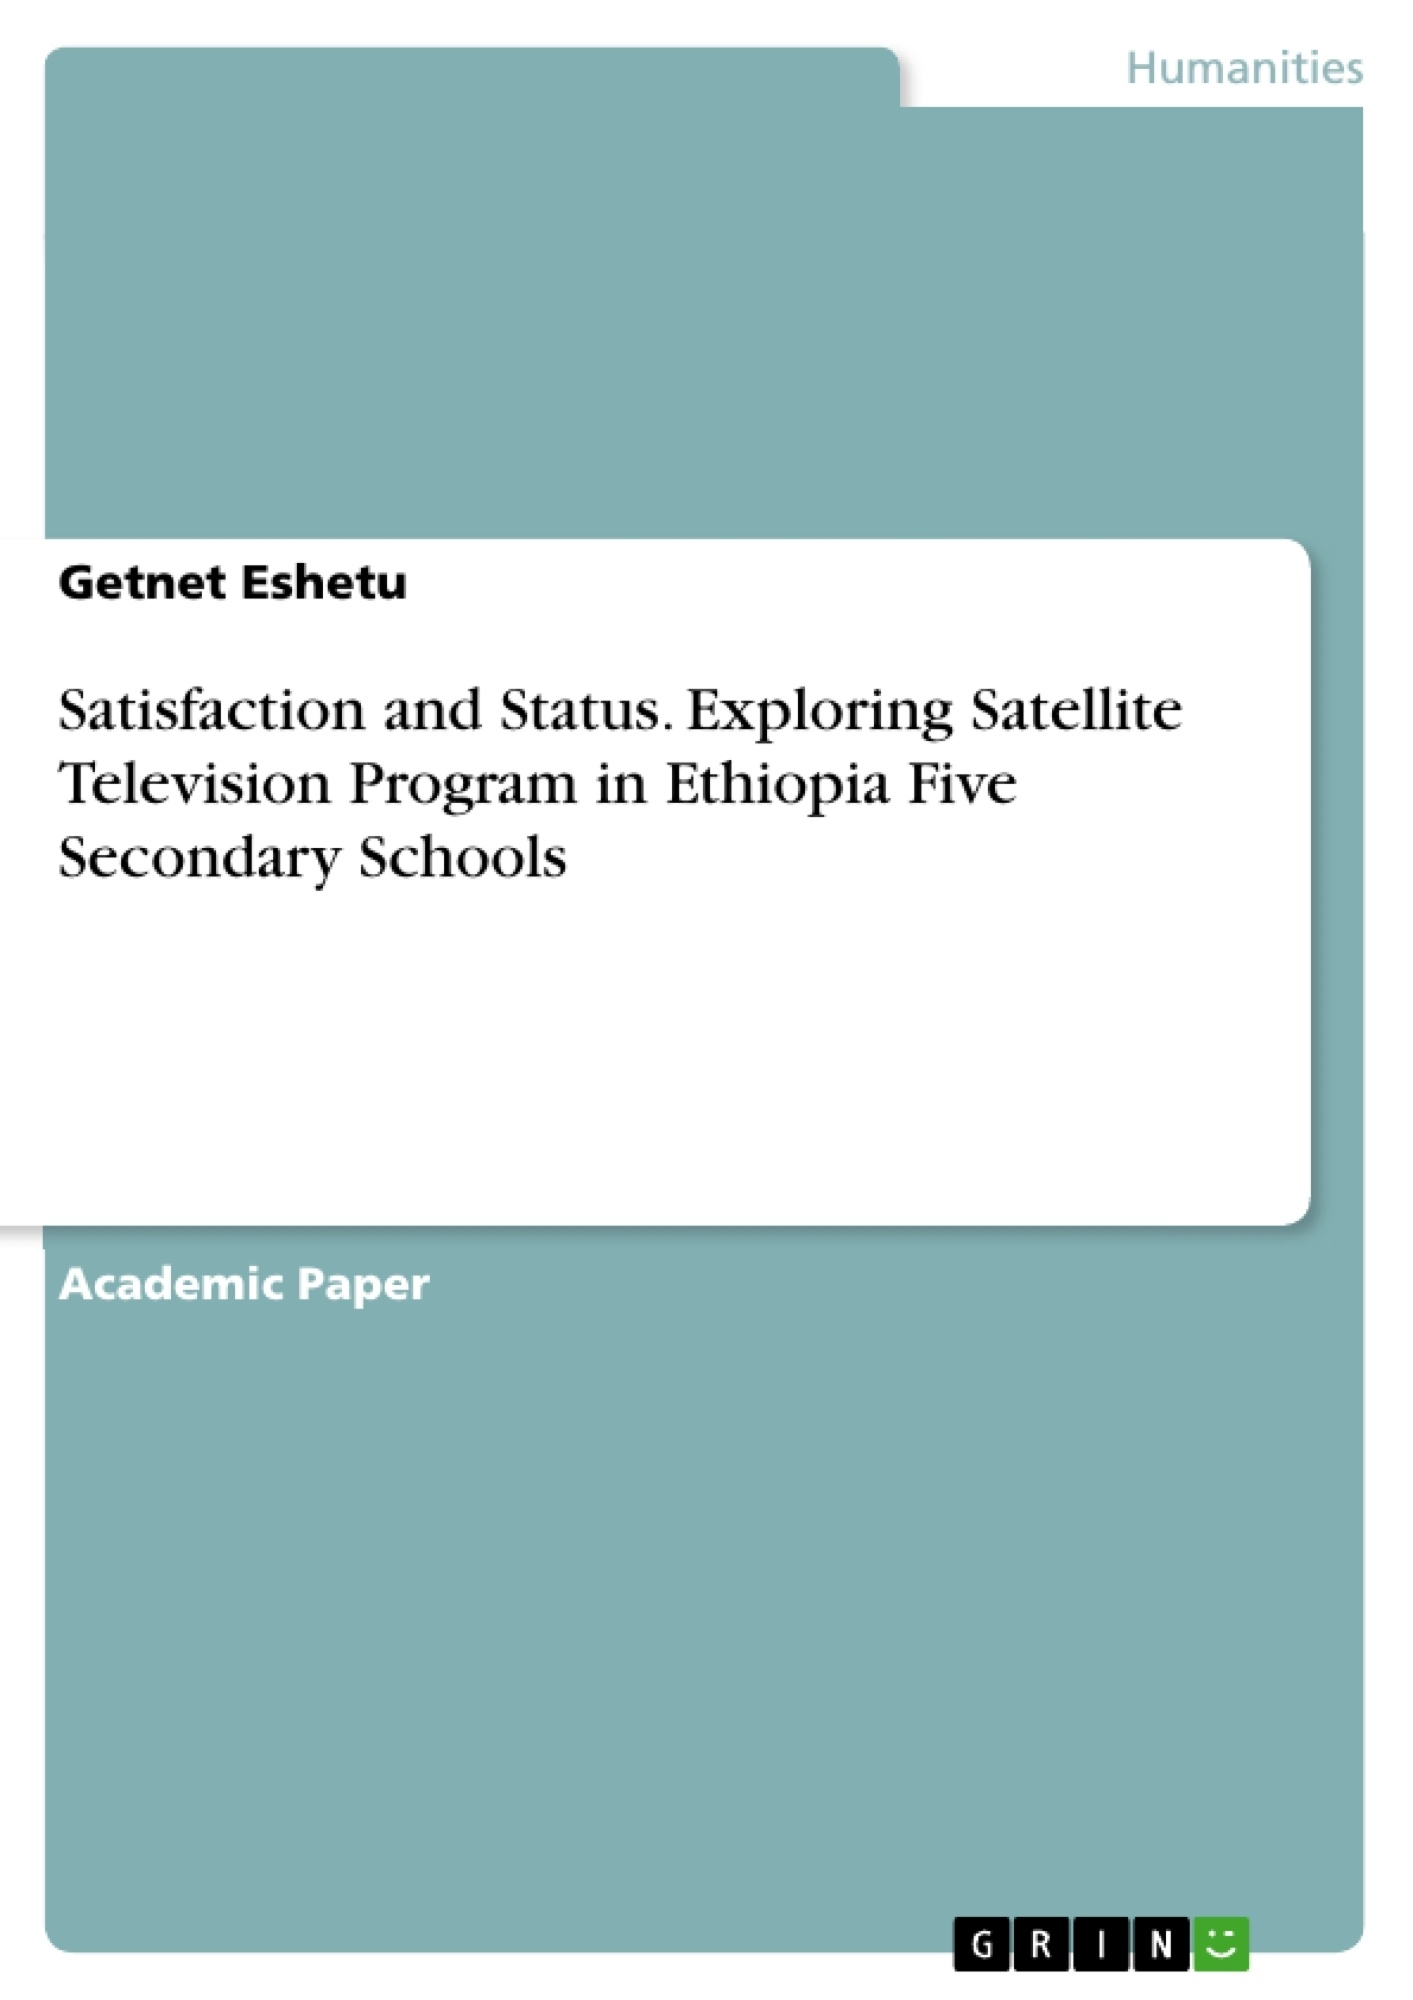 Title: Satisfaction and Status. Exploring Satellite Television Program in Ethiopia Five Secondary Schools